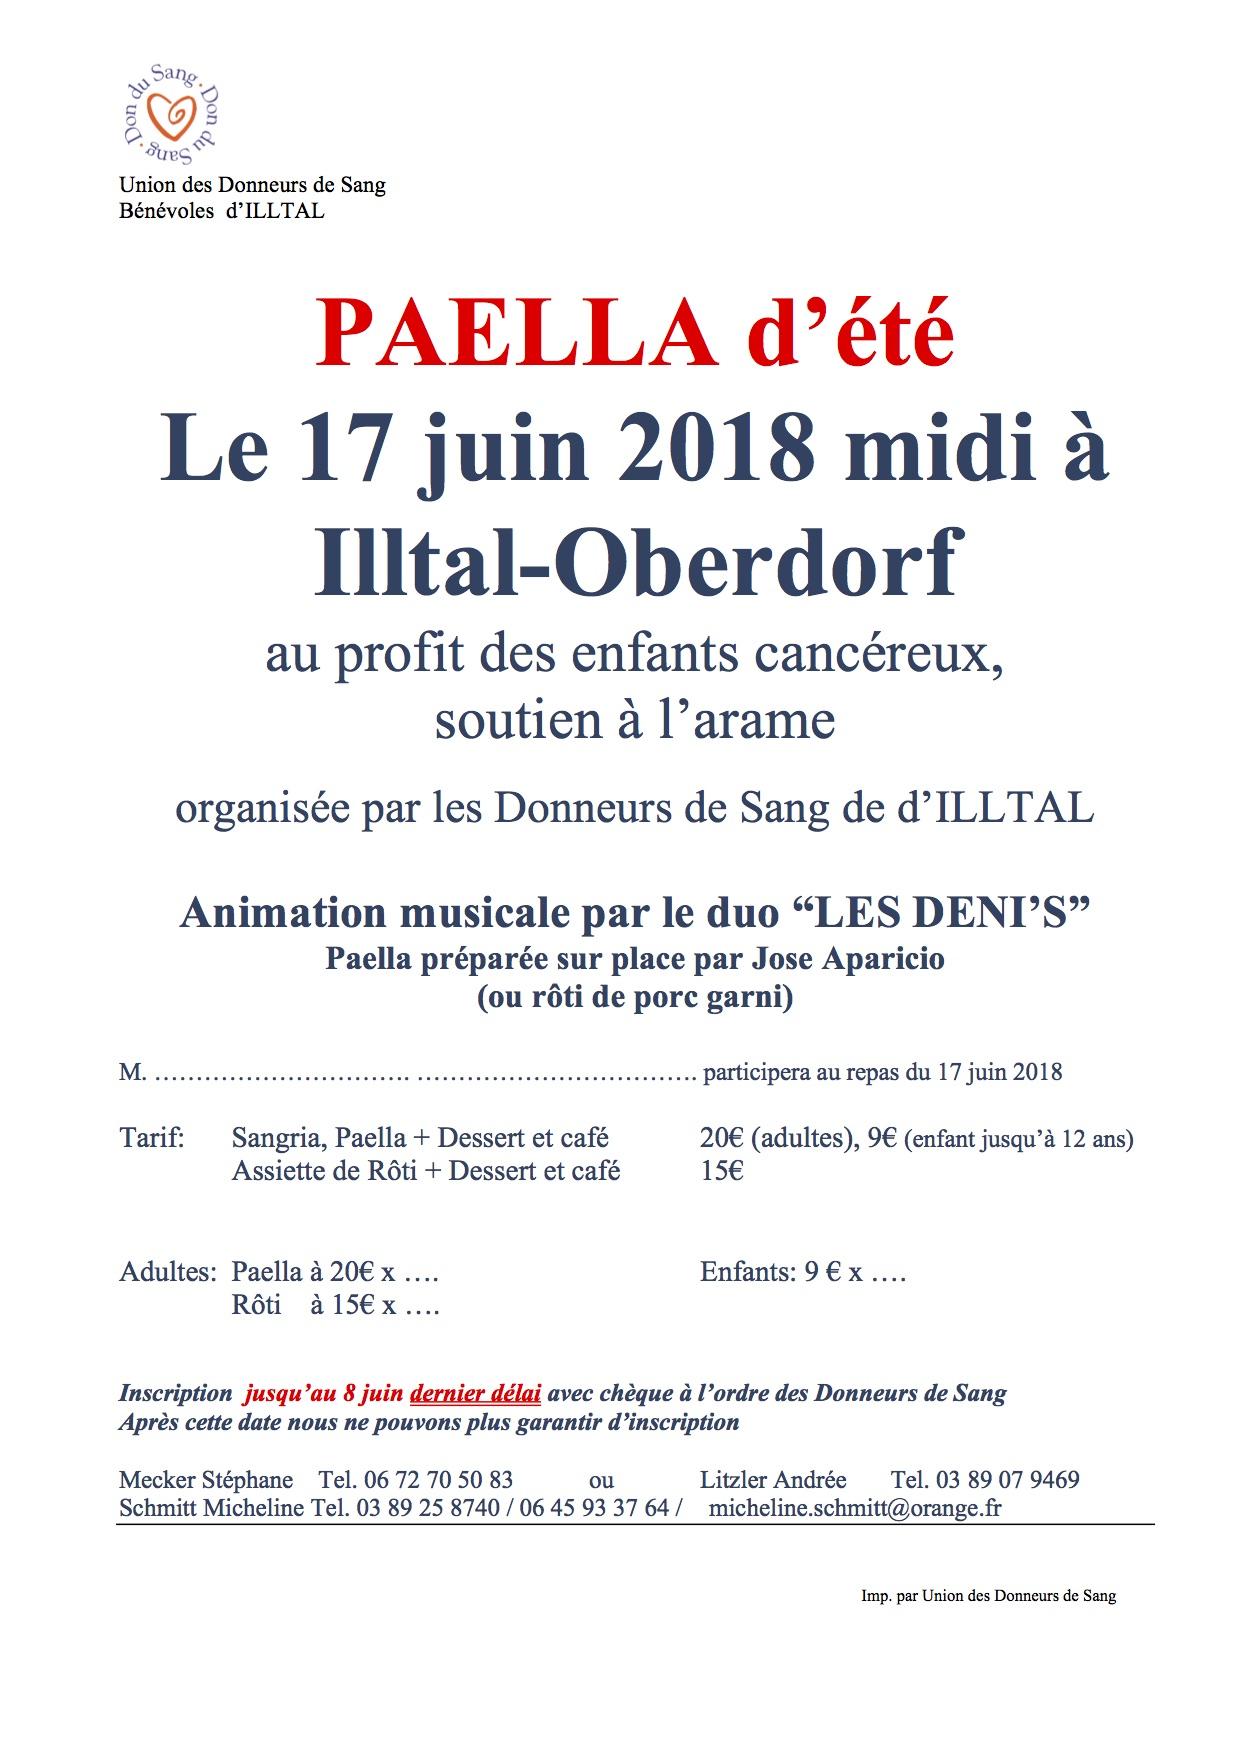 Paella d'été à Illtal-Oberdorf